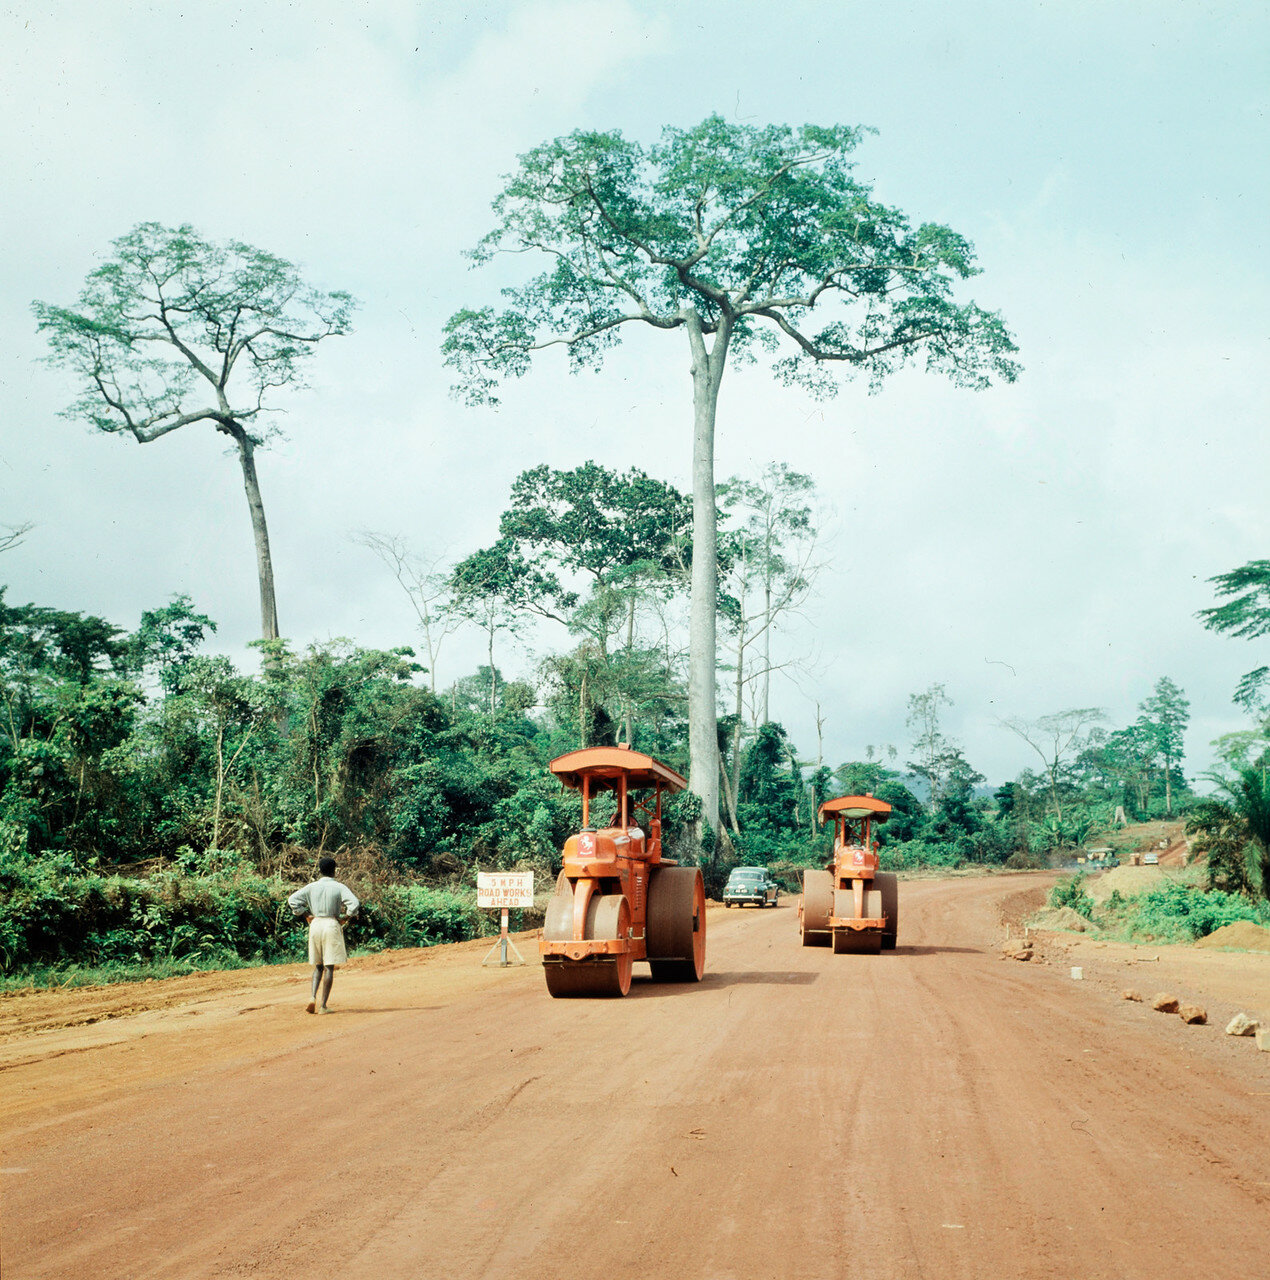 Обуаси. Строительство дороги